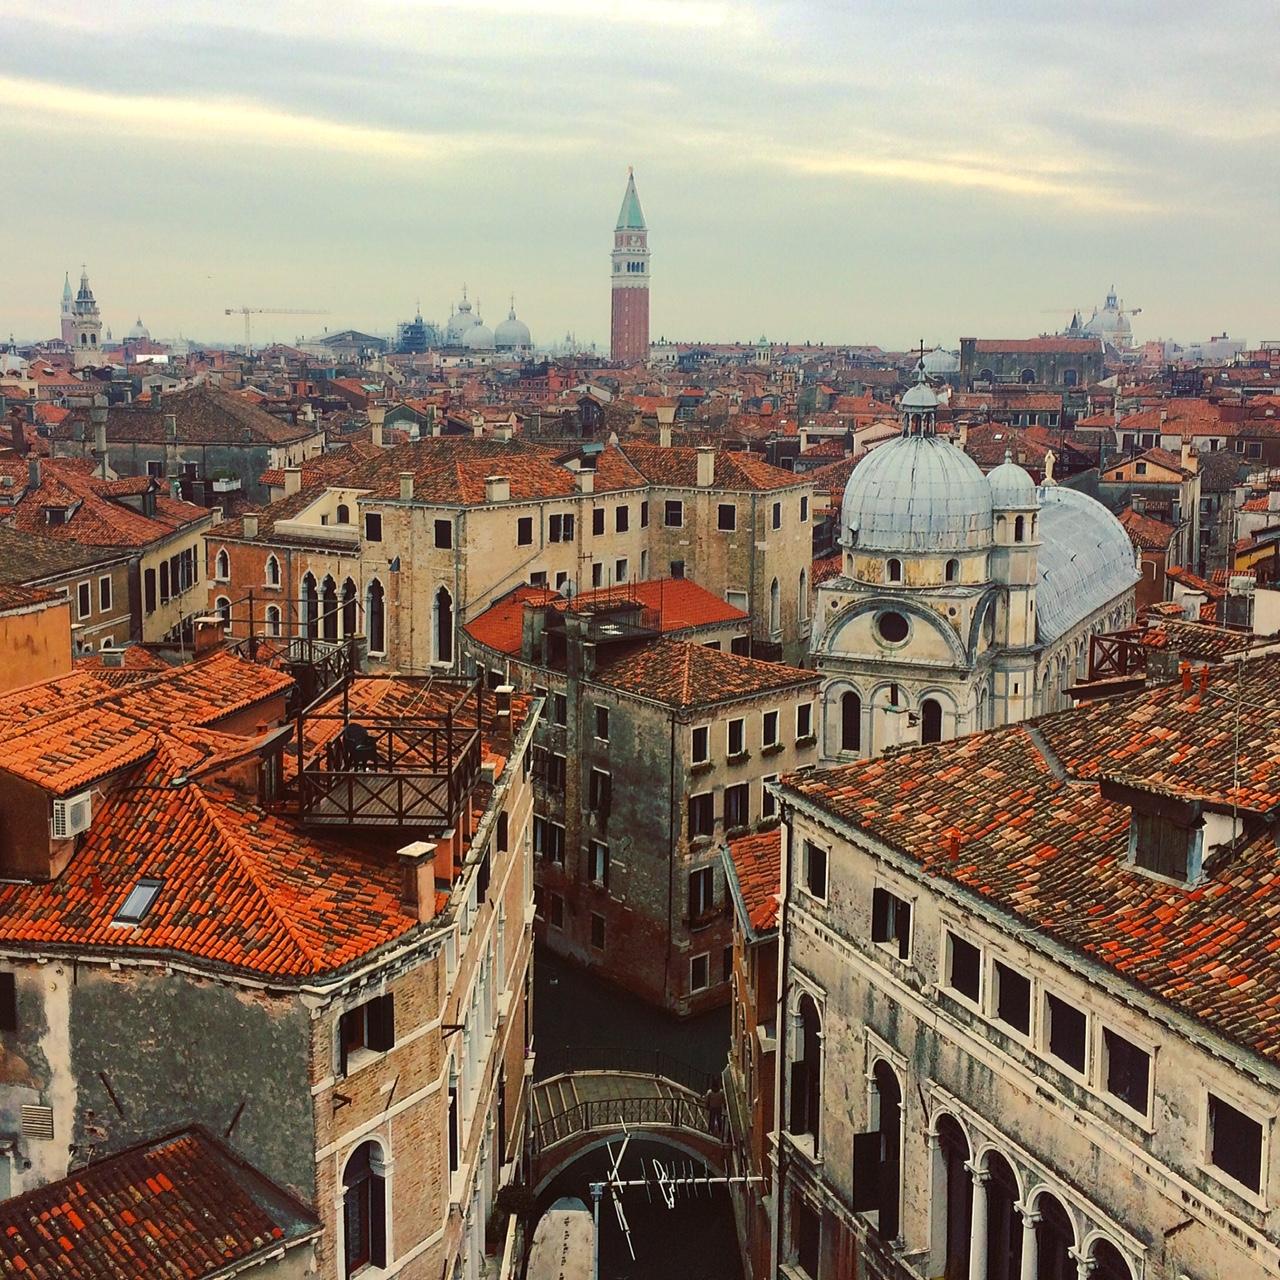 Dove rifugiarsi a Venezia d'inverno?